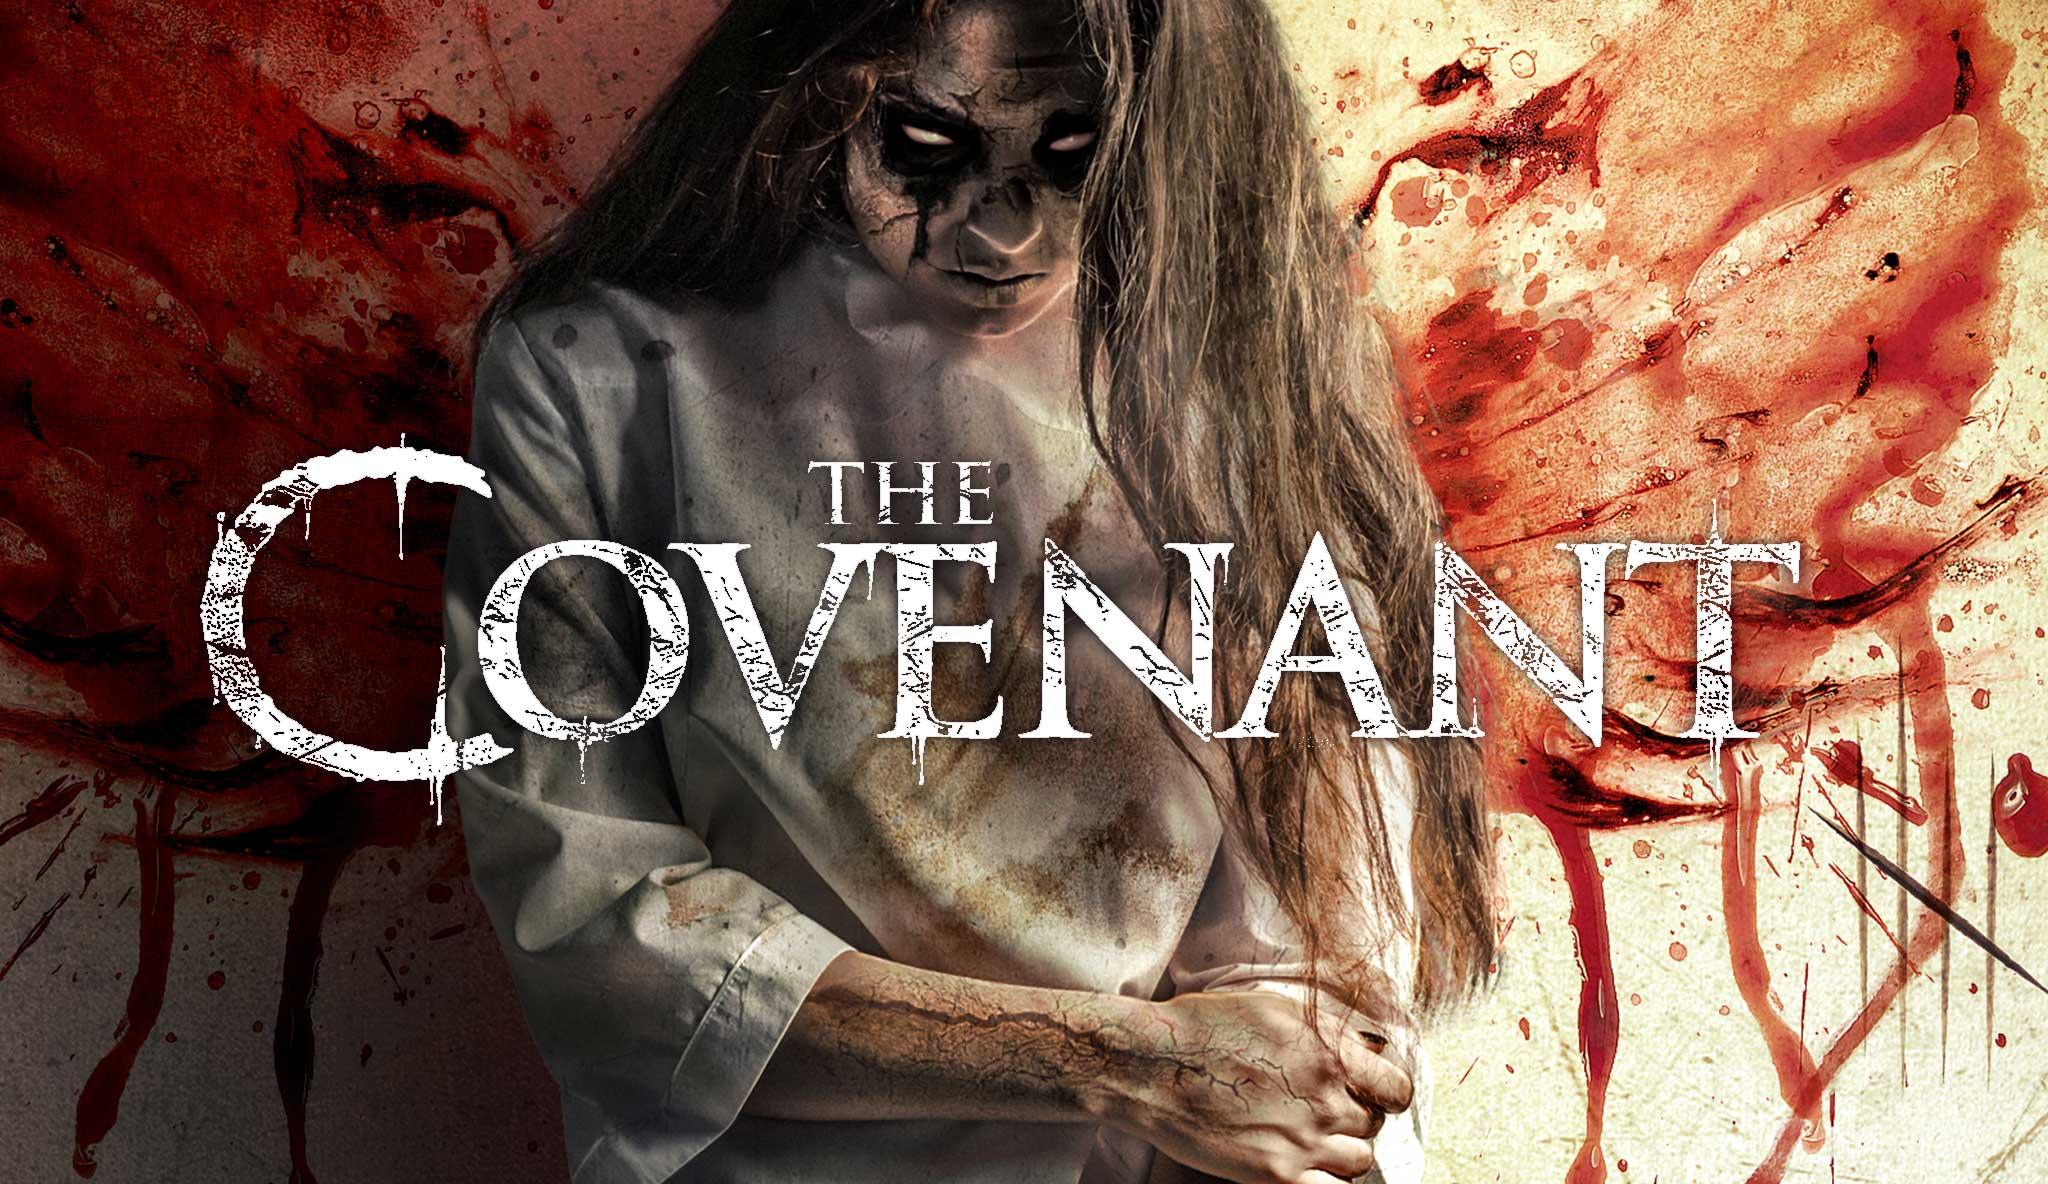 the-covenant-das-bose-ist-hier\header.jpg